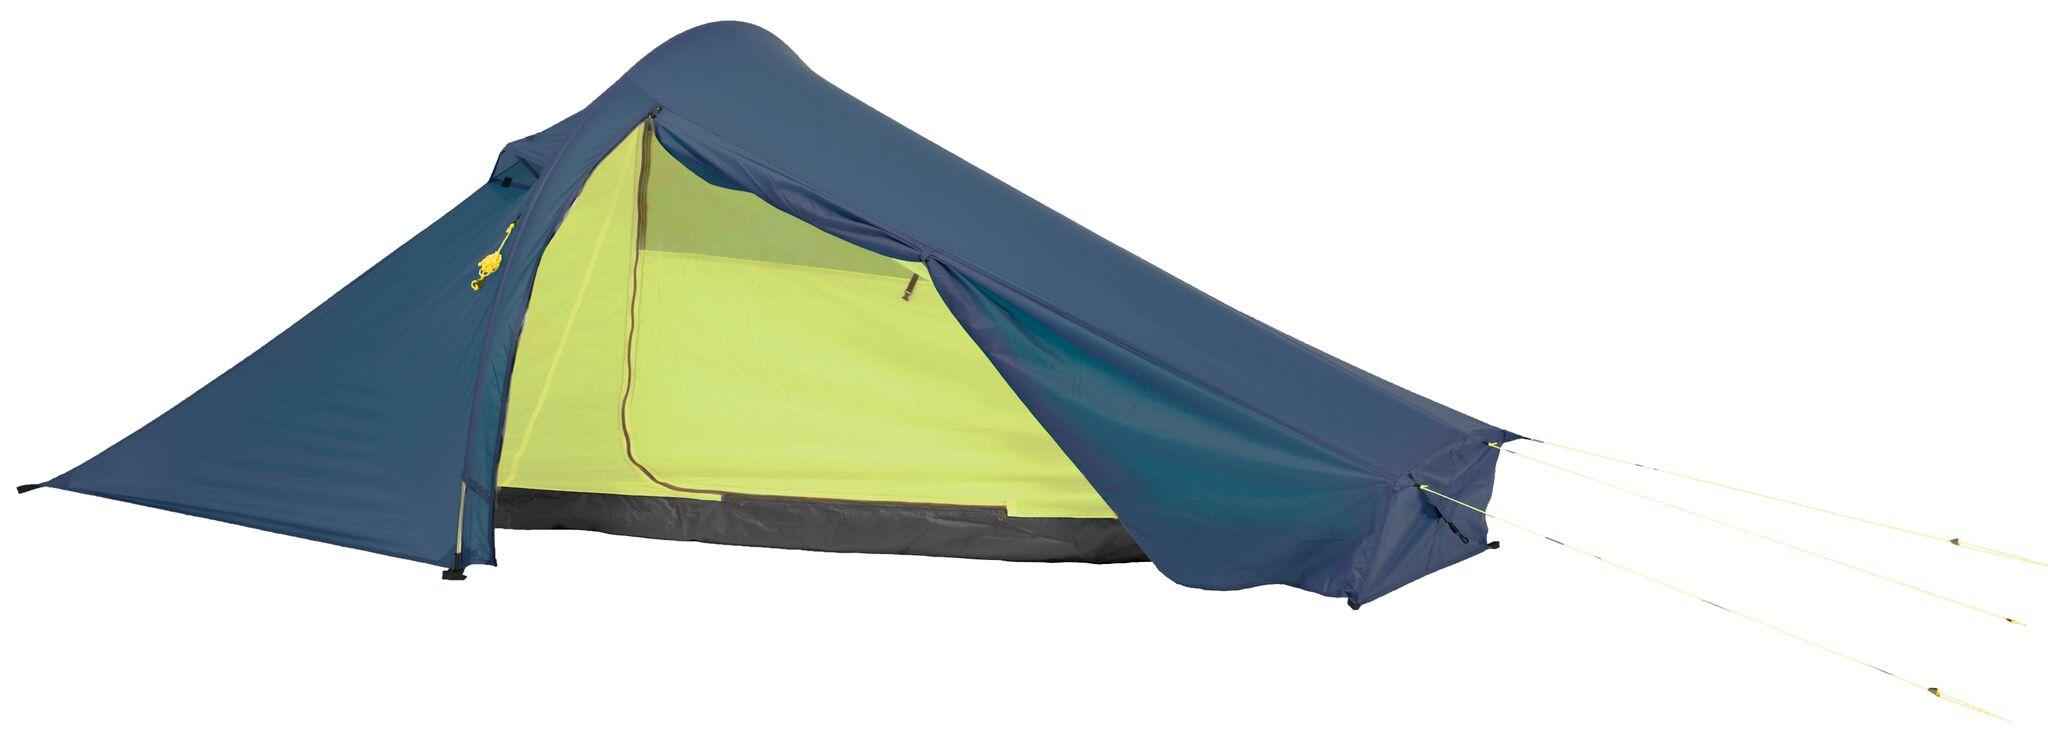 Helsport Ringstind Superlight 2 - Tent